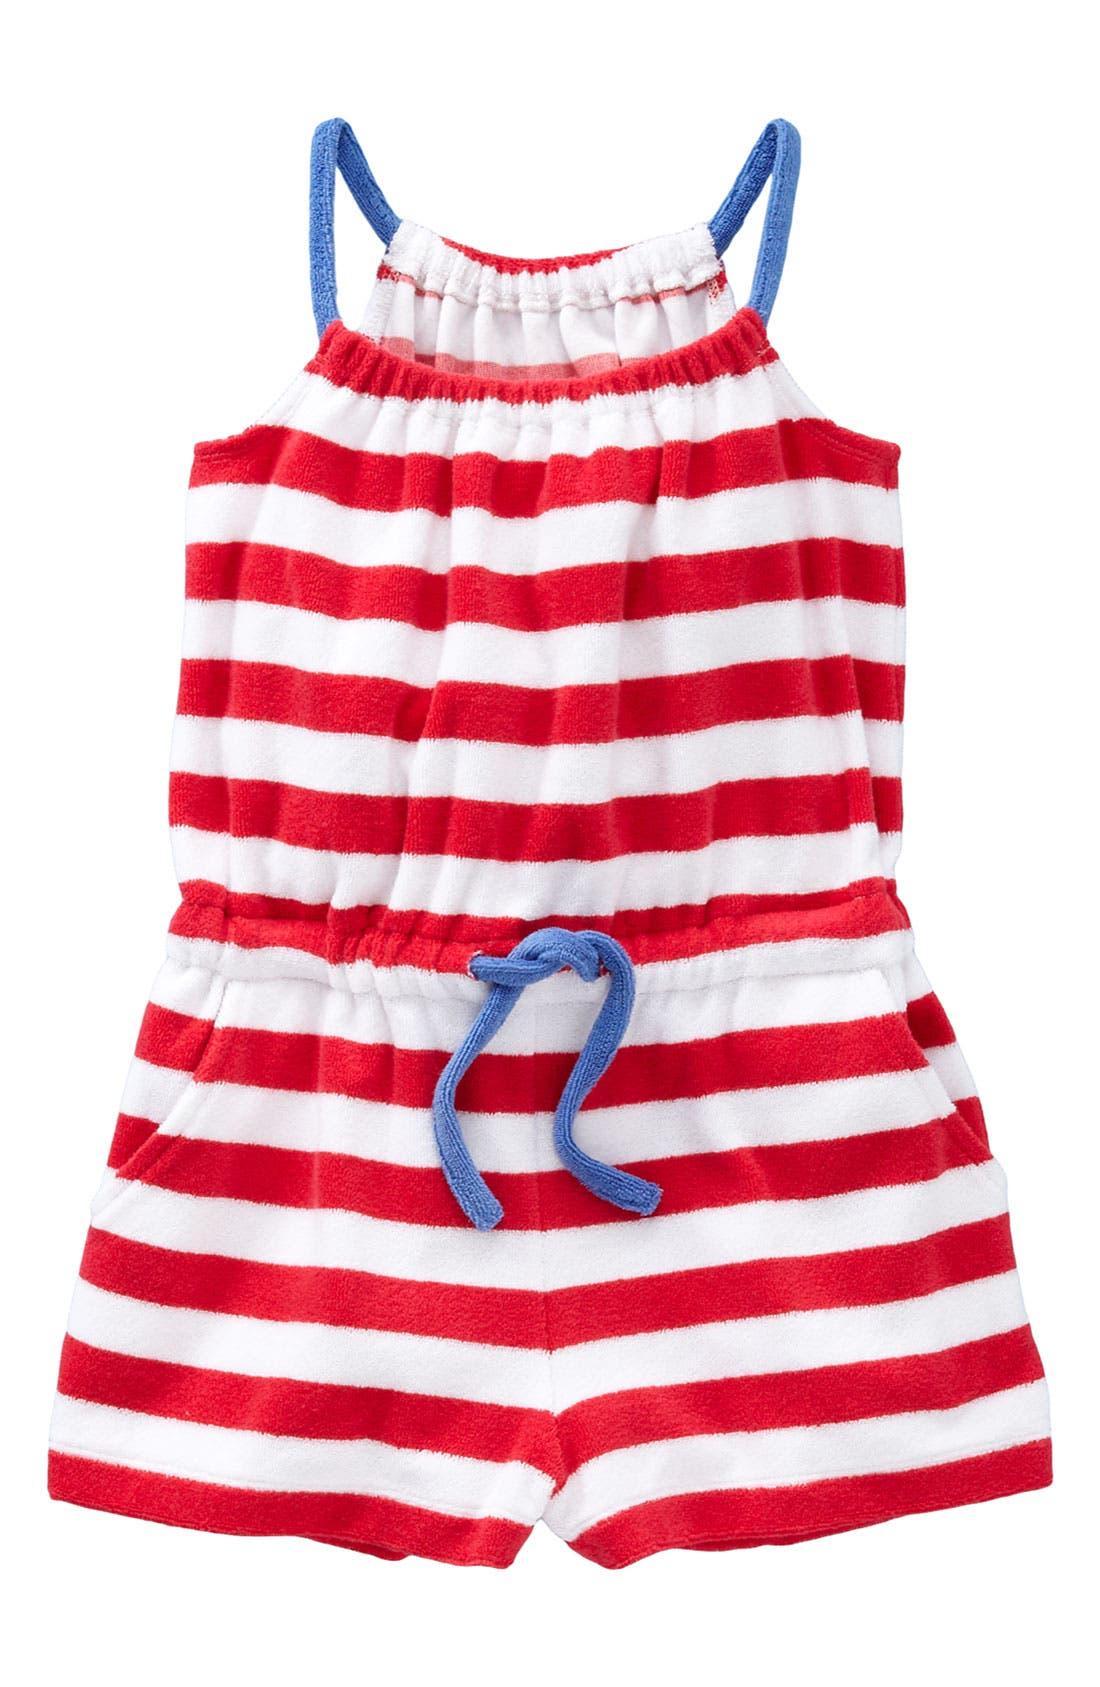 Main Image - Mini Boden Romper (Toddler)